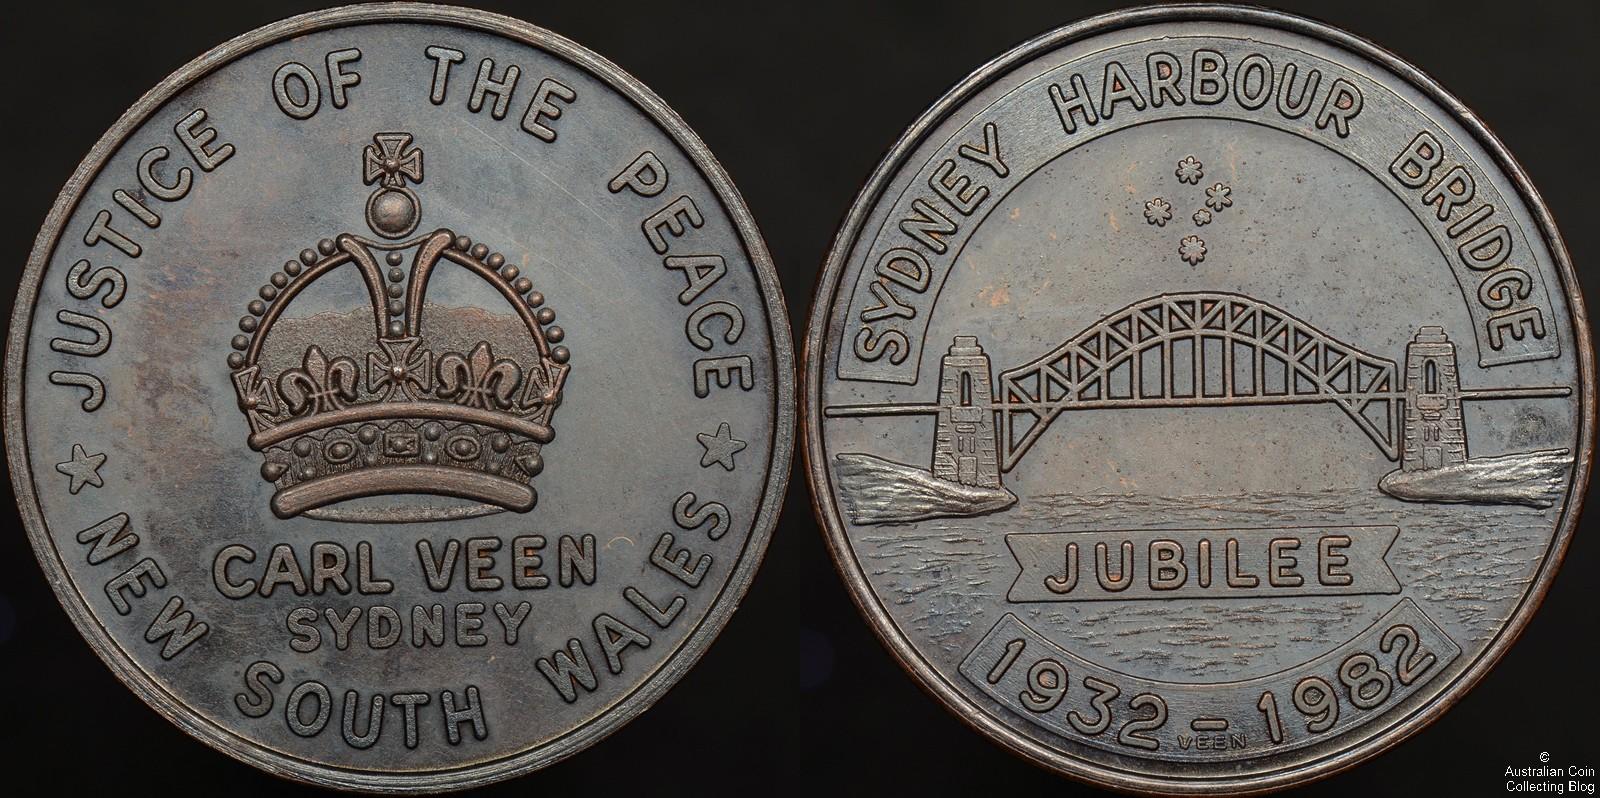 Sydney Harbour Bridge 1932-1982 Jubilee Carl Veen Medal 1982/32